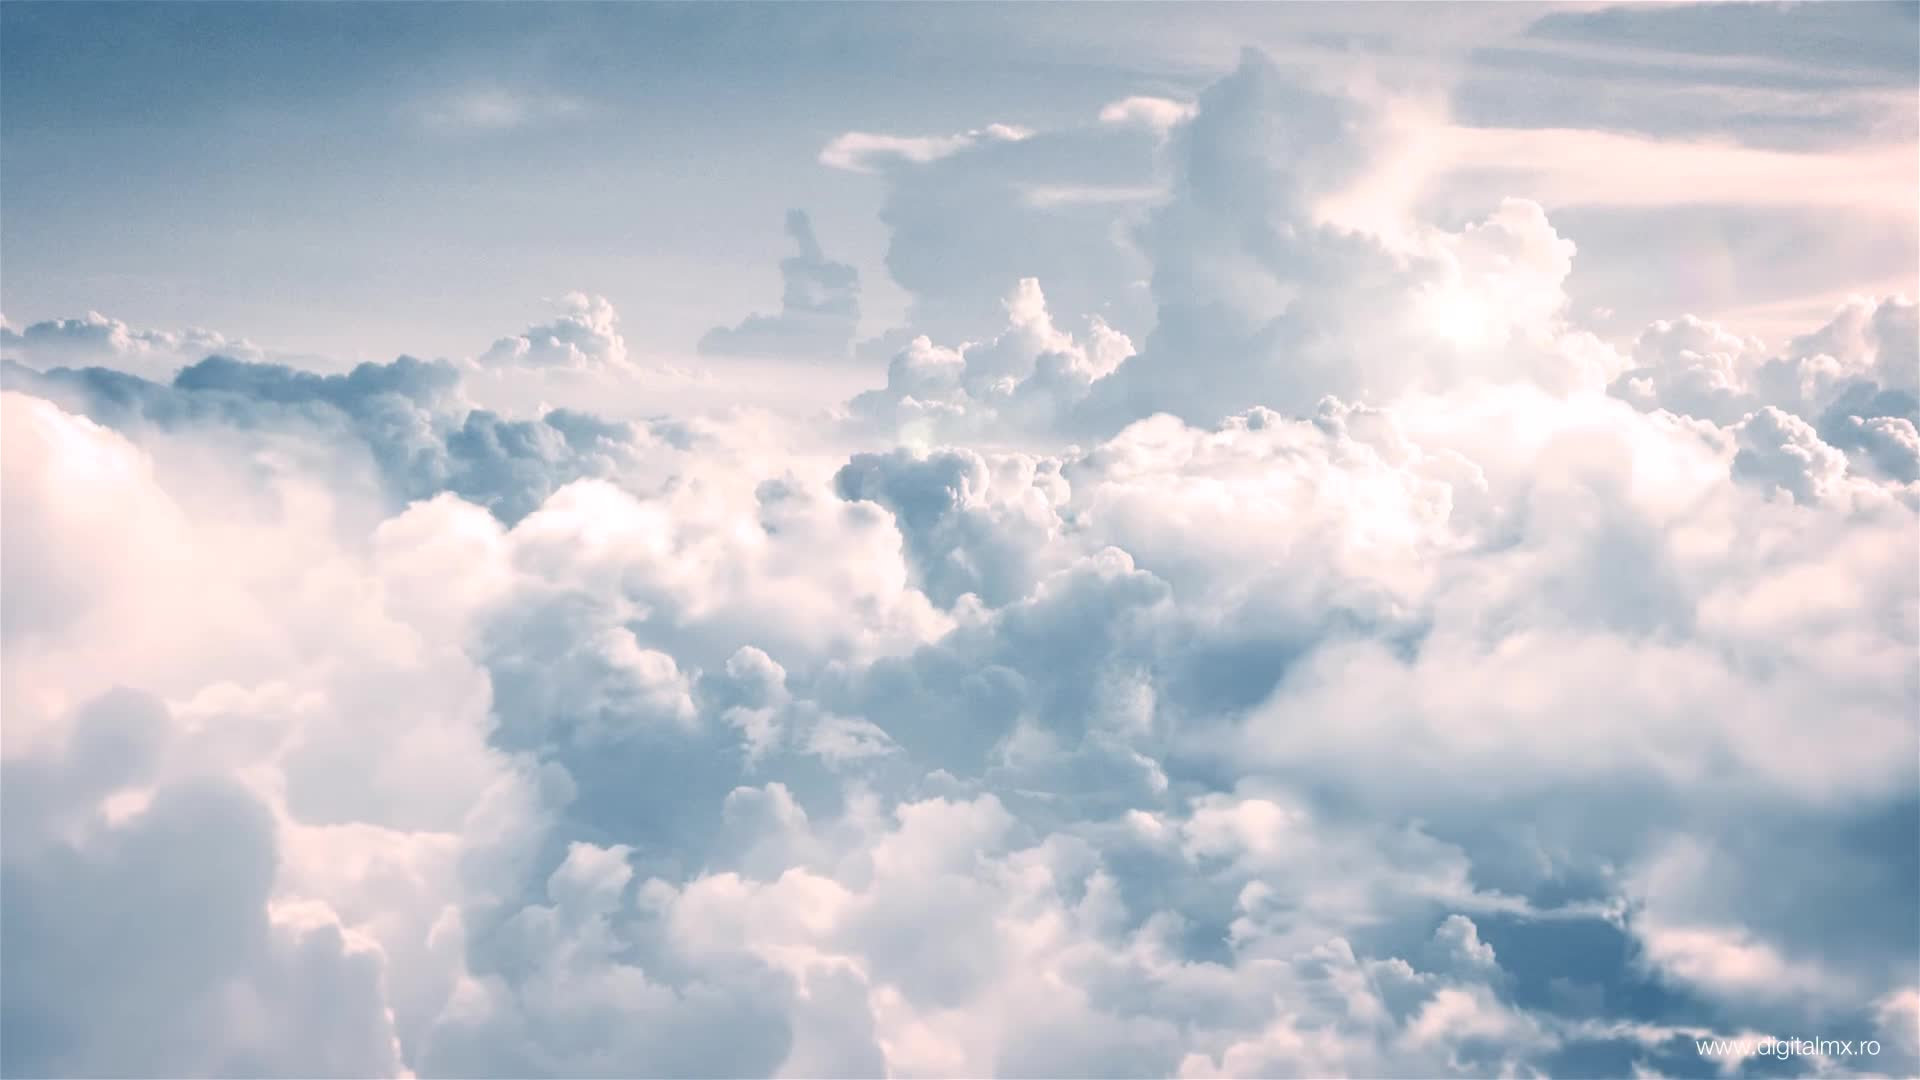 Гифка плывущие облака, железа картинки физике